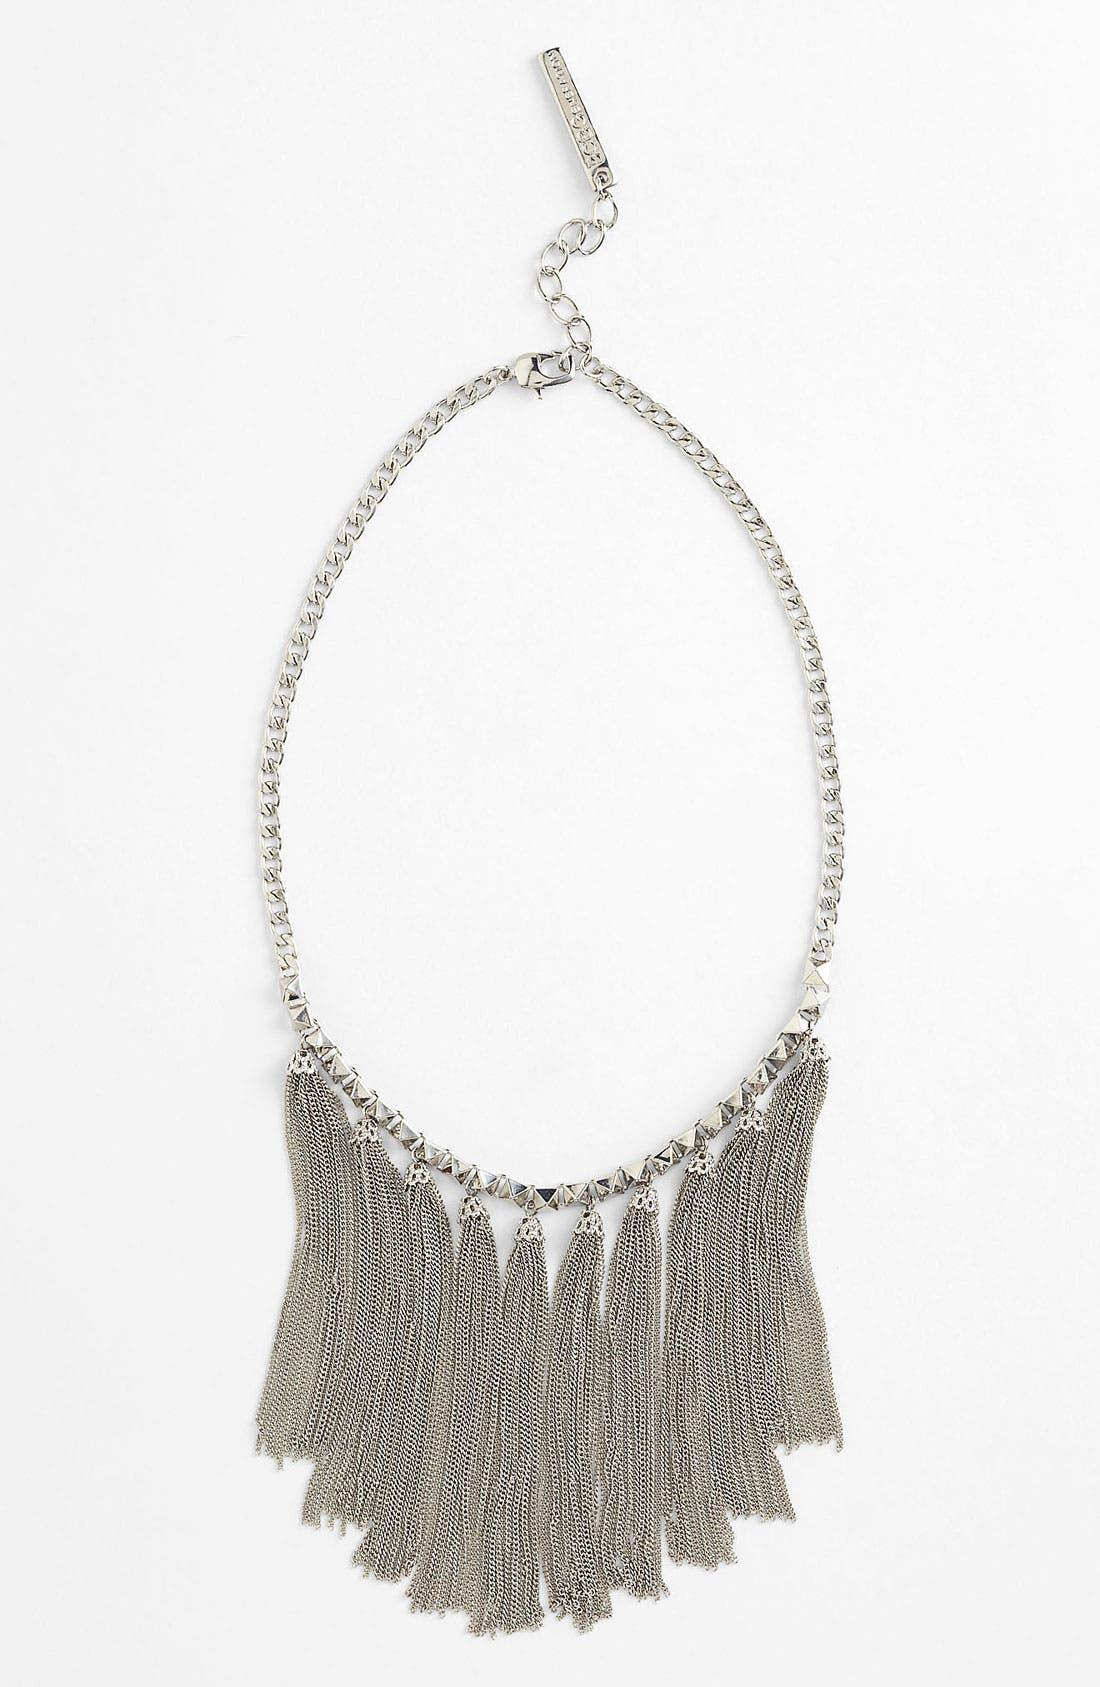 Alternate Image 1 Selected - BCBGeneration 'The Standard' Tassel Necklace